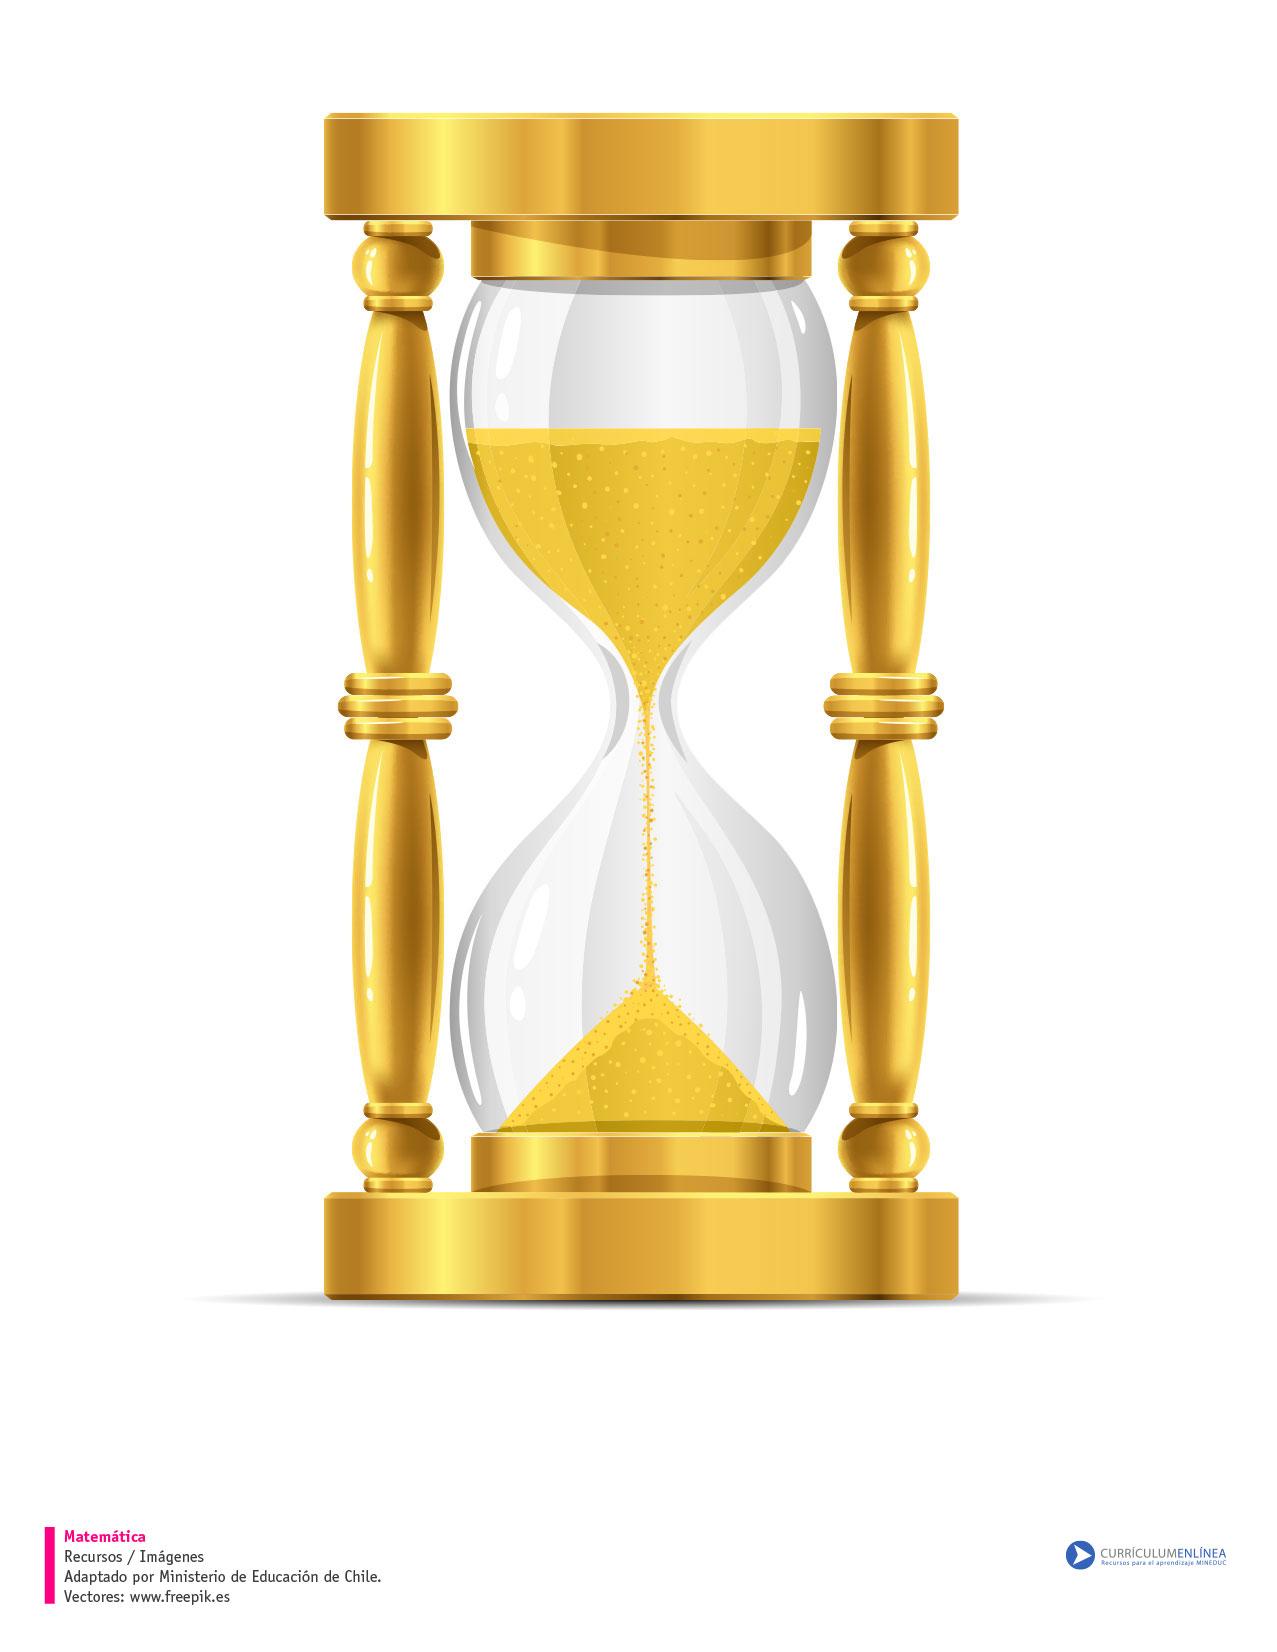 Reloj De Arena Curriculum Nacional Mineduc Chile